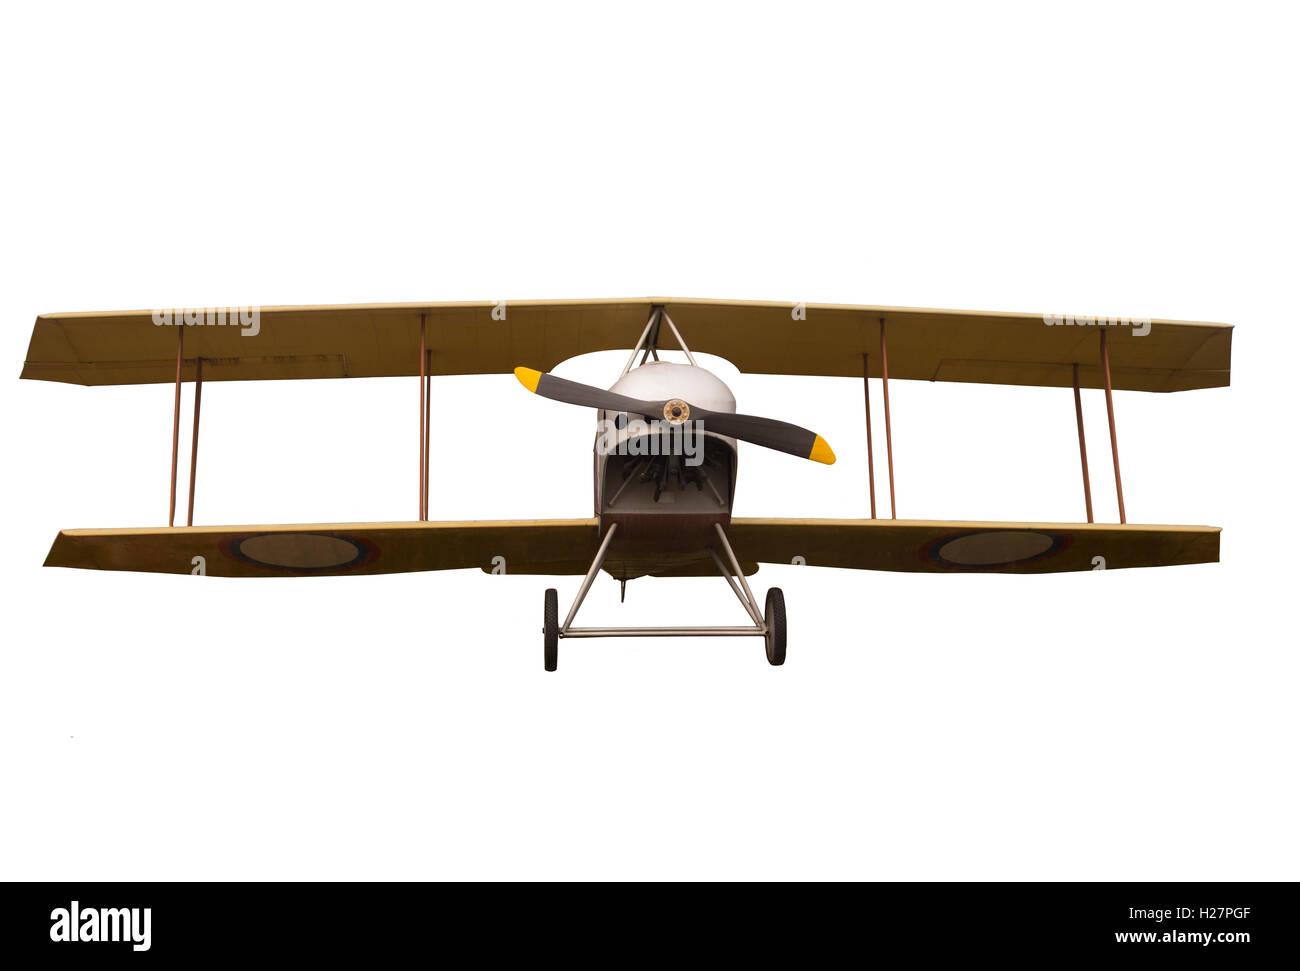 Vintage Propeller Biplane Isolated on White Background - Stock Image